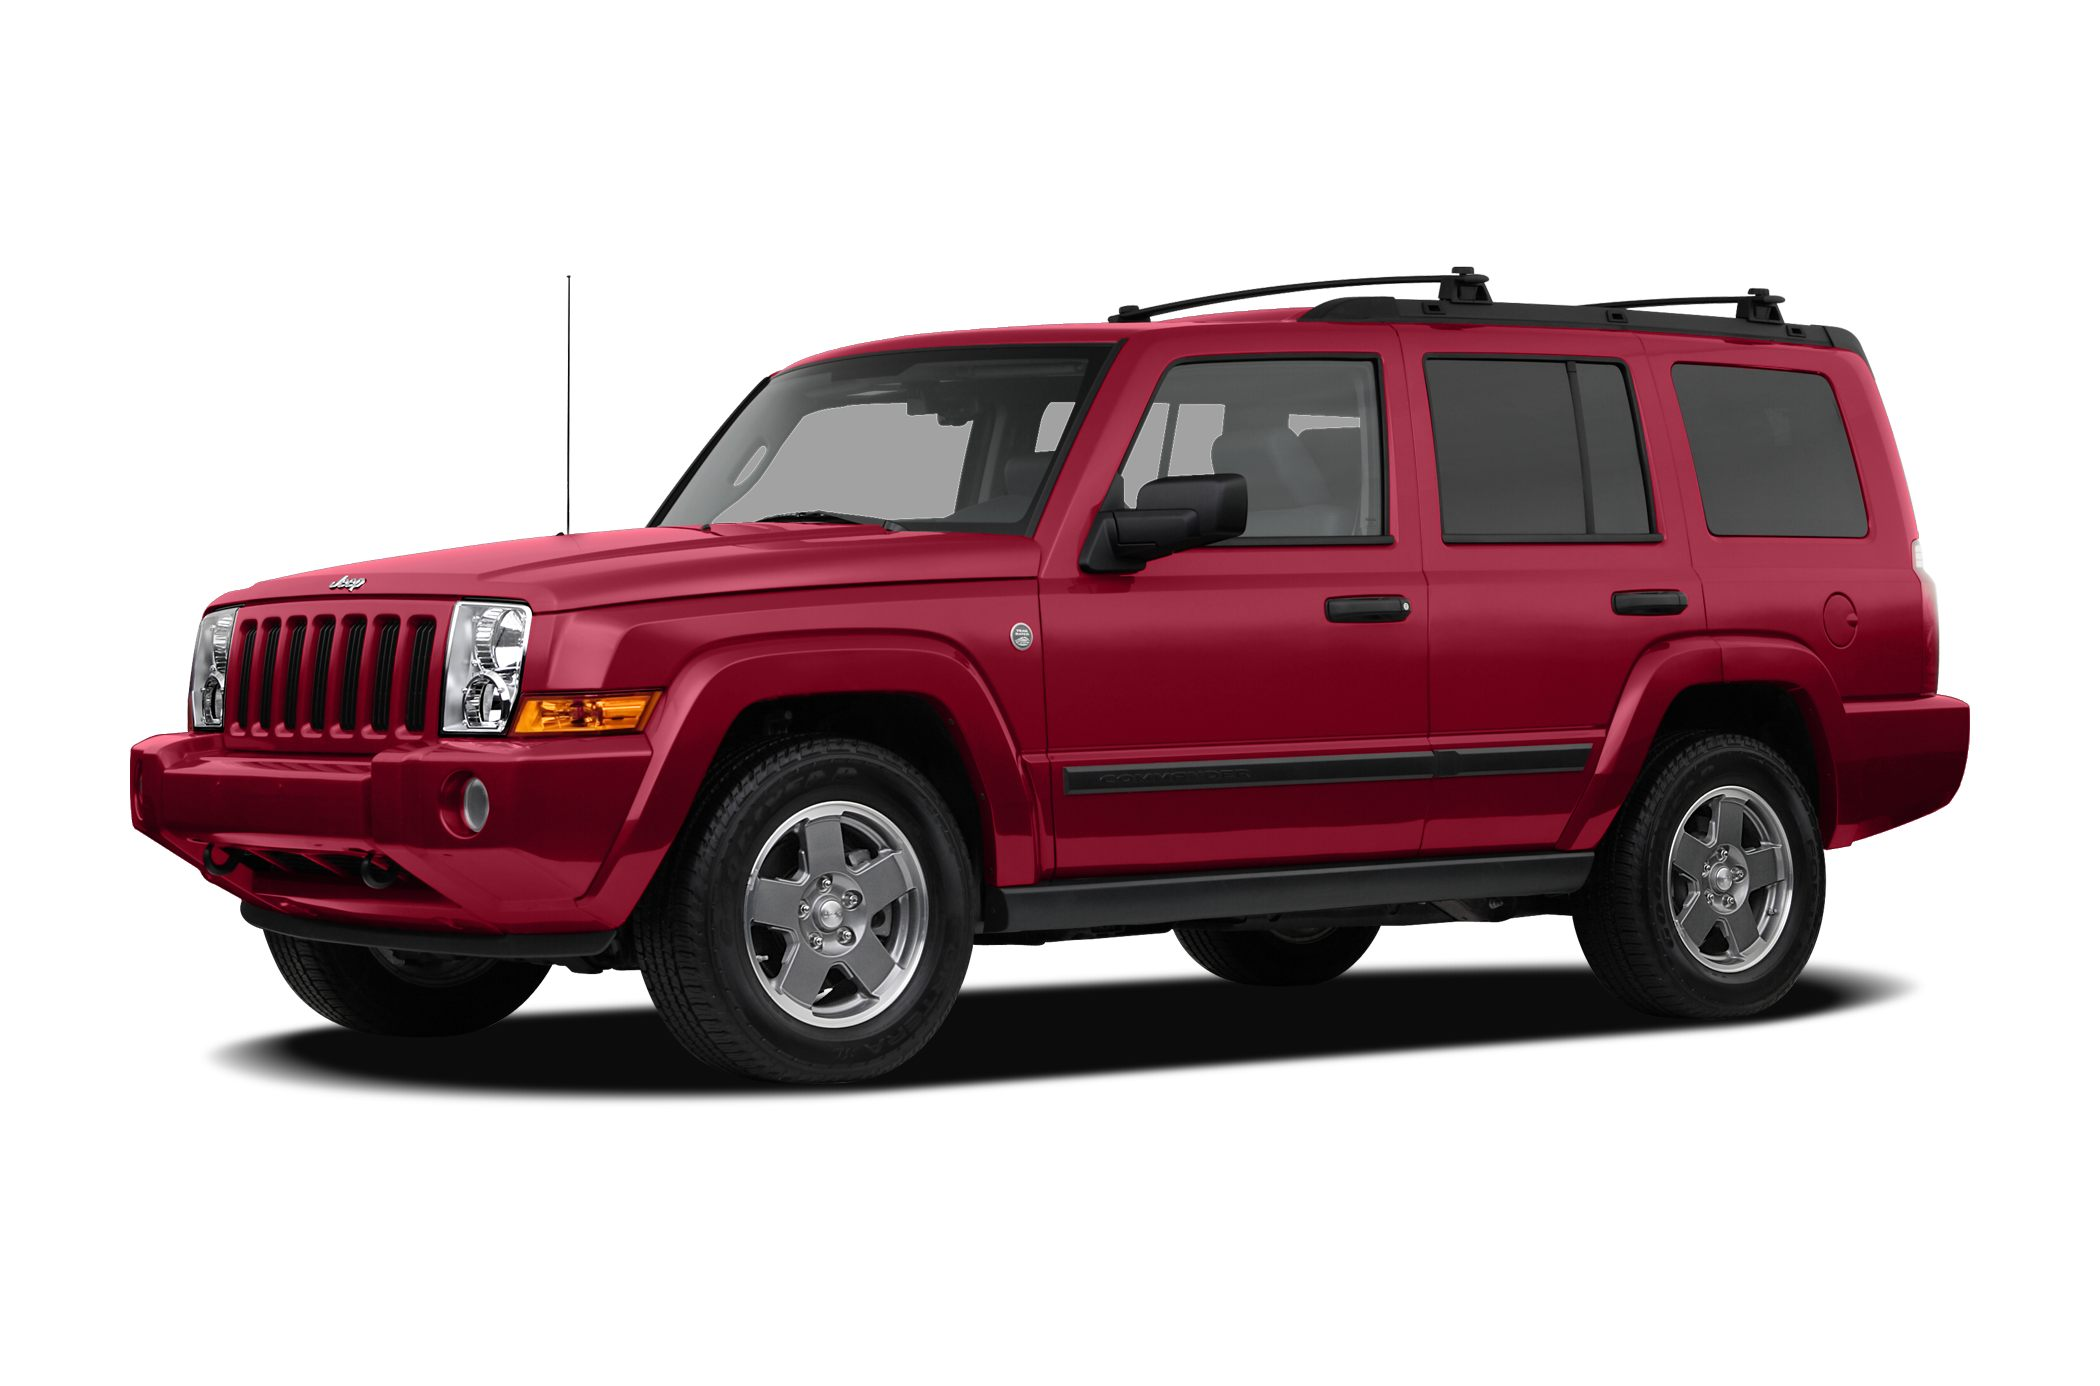 Jeep Commander 2007 Reviews